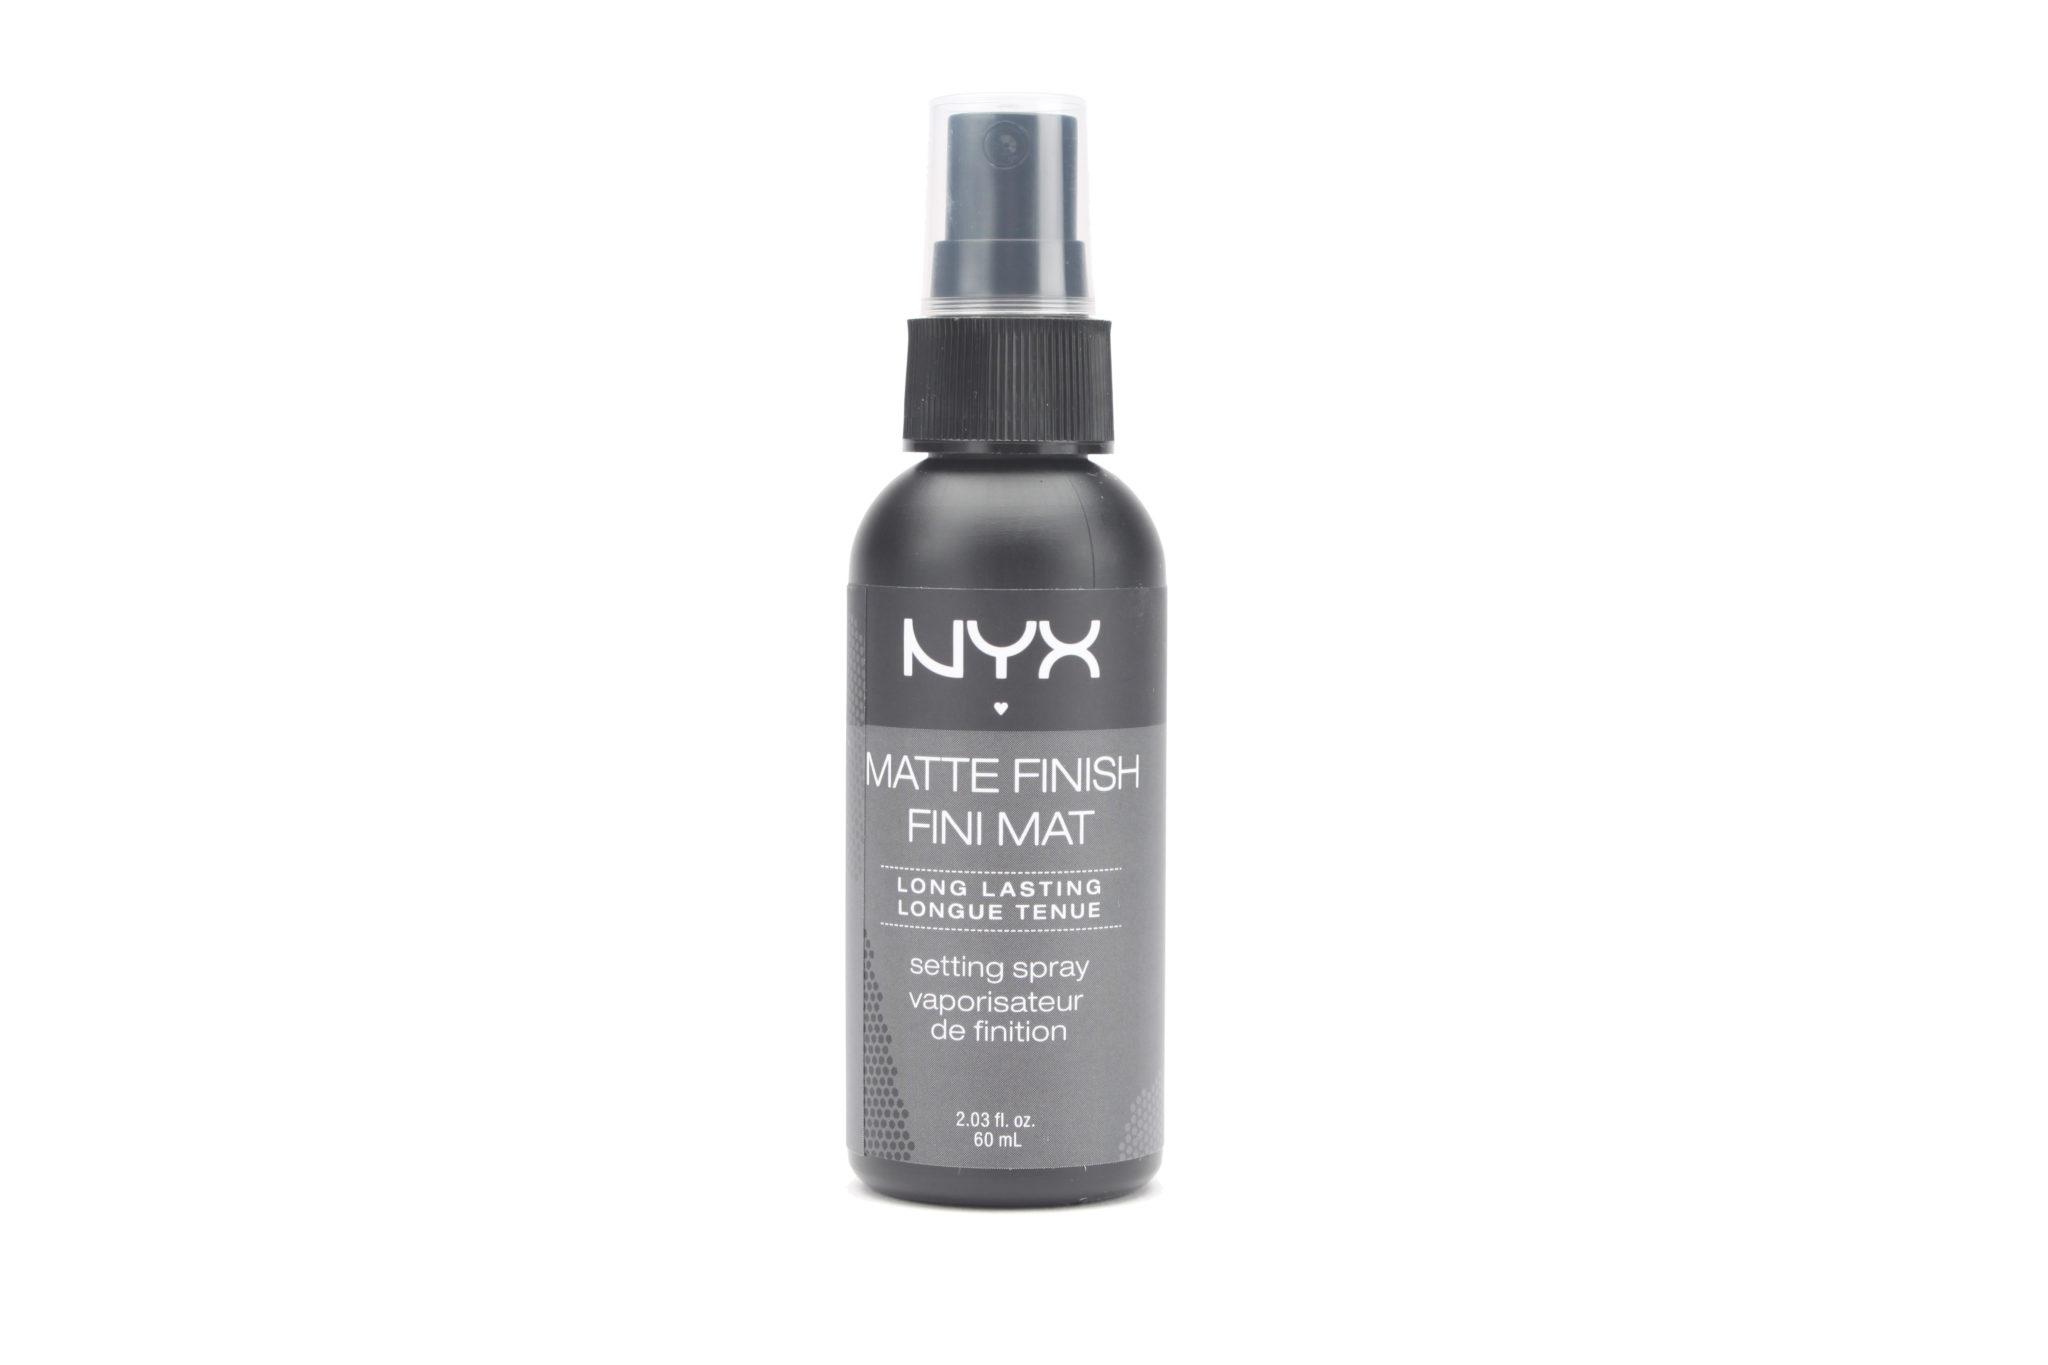 60855 Makeup Setting Spray Matte Finish 2.03 oz